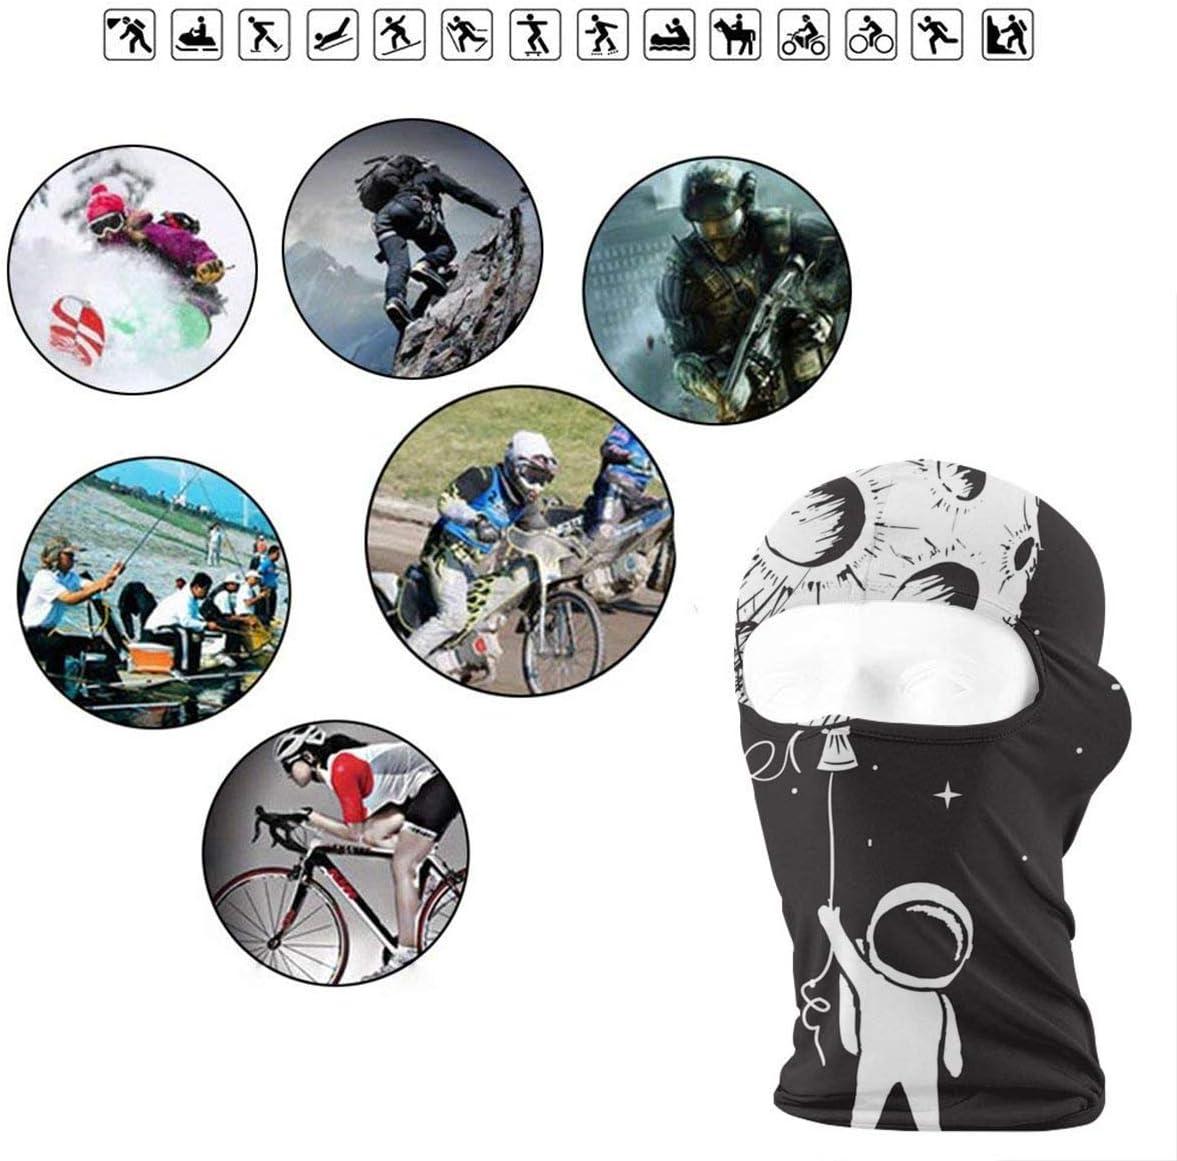 Jxrodekz Balaclava Astronaut Keeps A Moon Motorcycle Face Masks Windproof Ski Mask Sports Balaclava